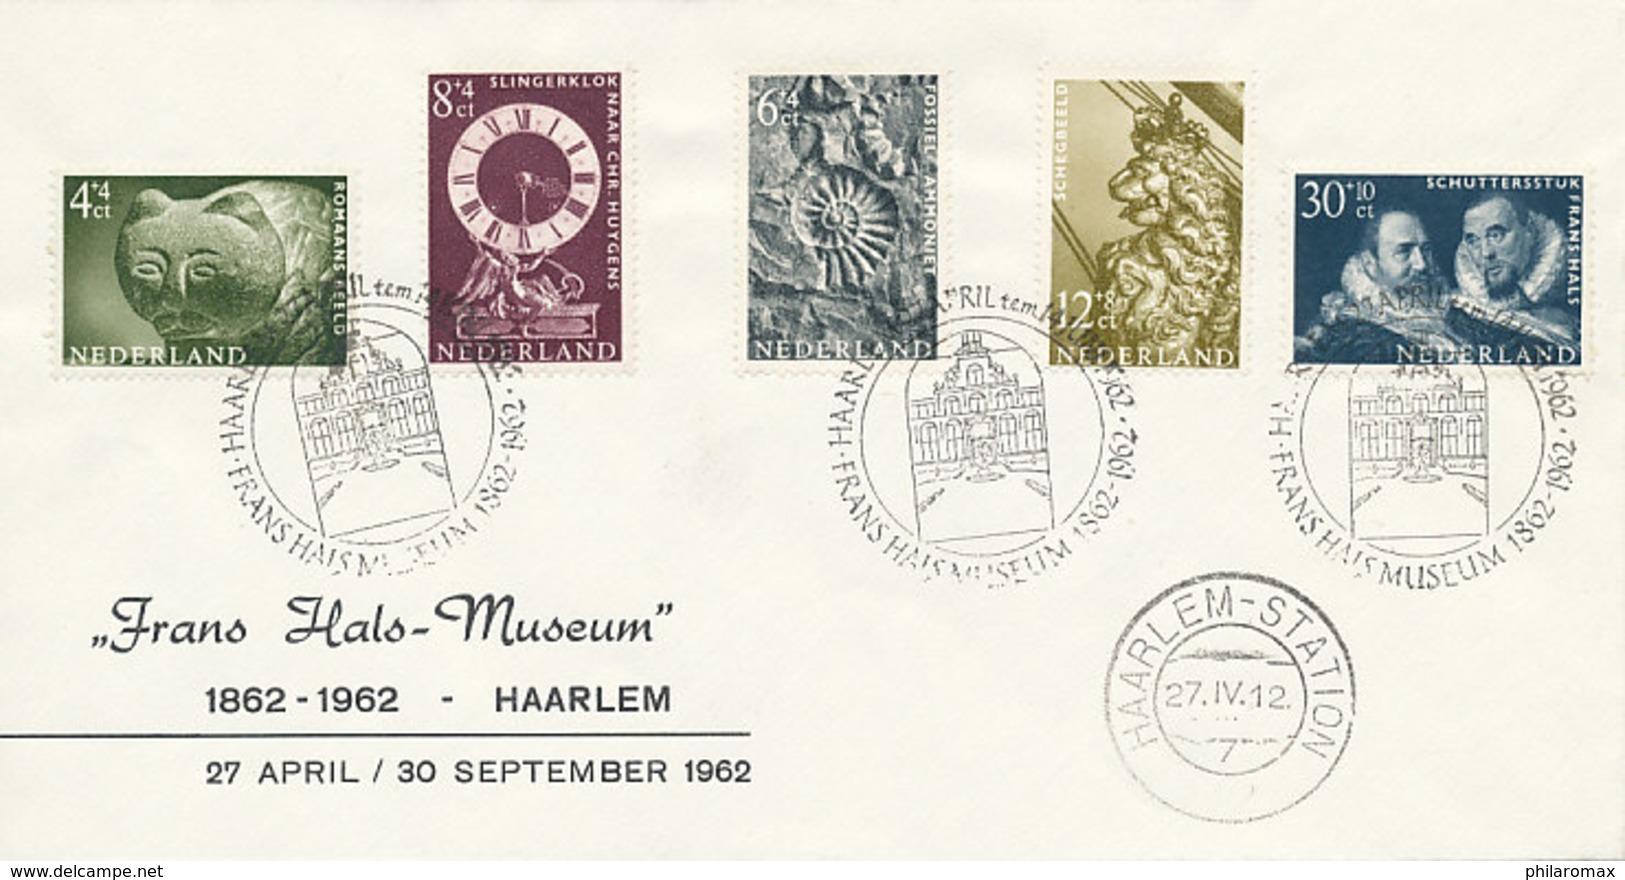 DC-0803 - 1962 NETHERLANDS - FDC ZOMERZEGELS FRANS HALS MUSEUM HAARLEM - STEMPEL FRANS HALS MUSEUM - FDC